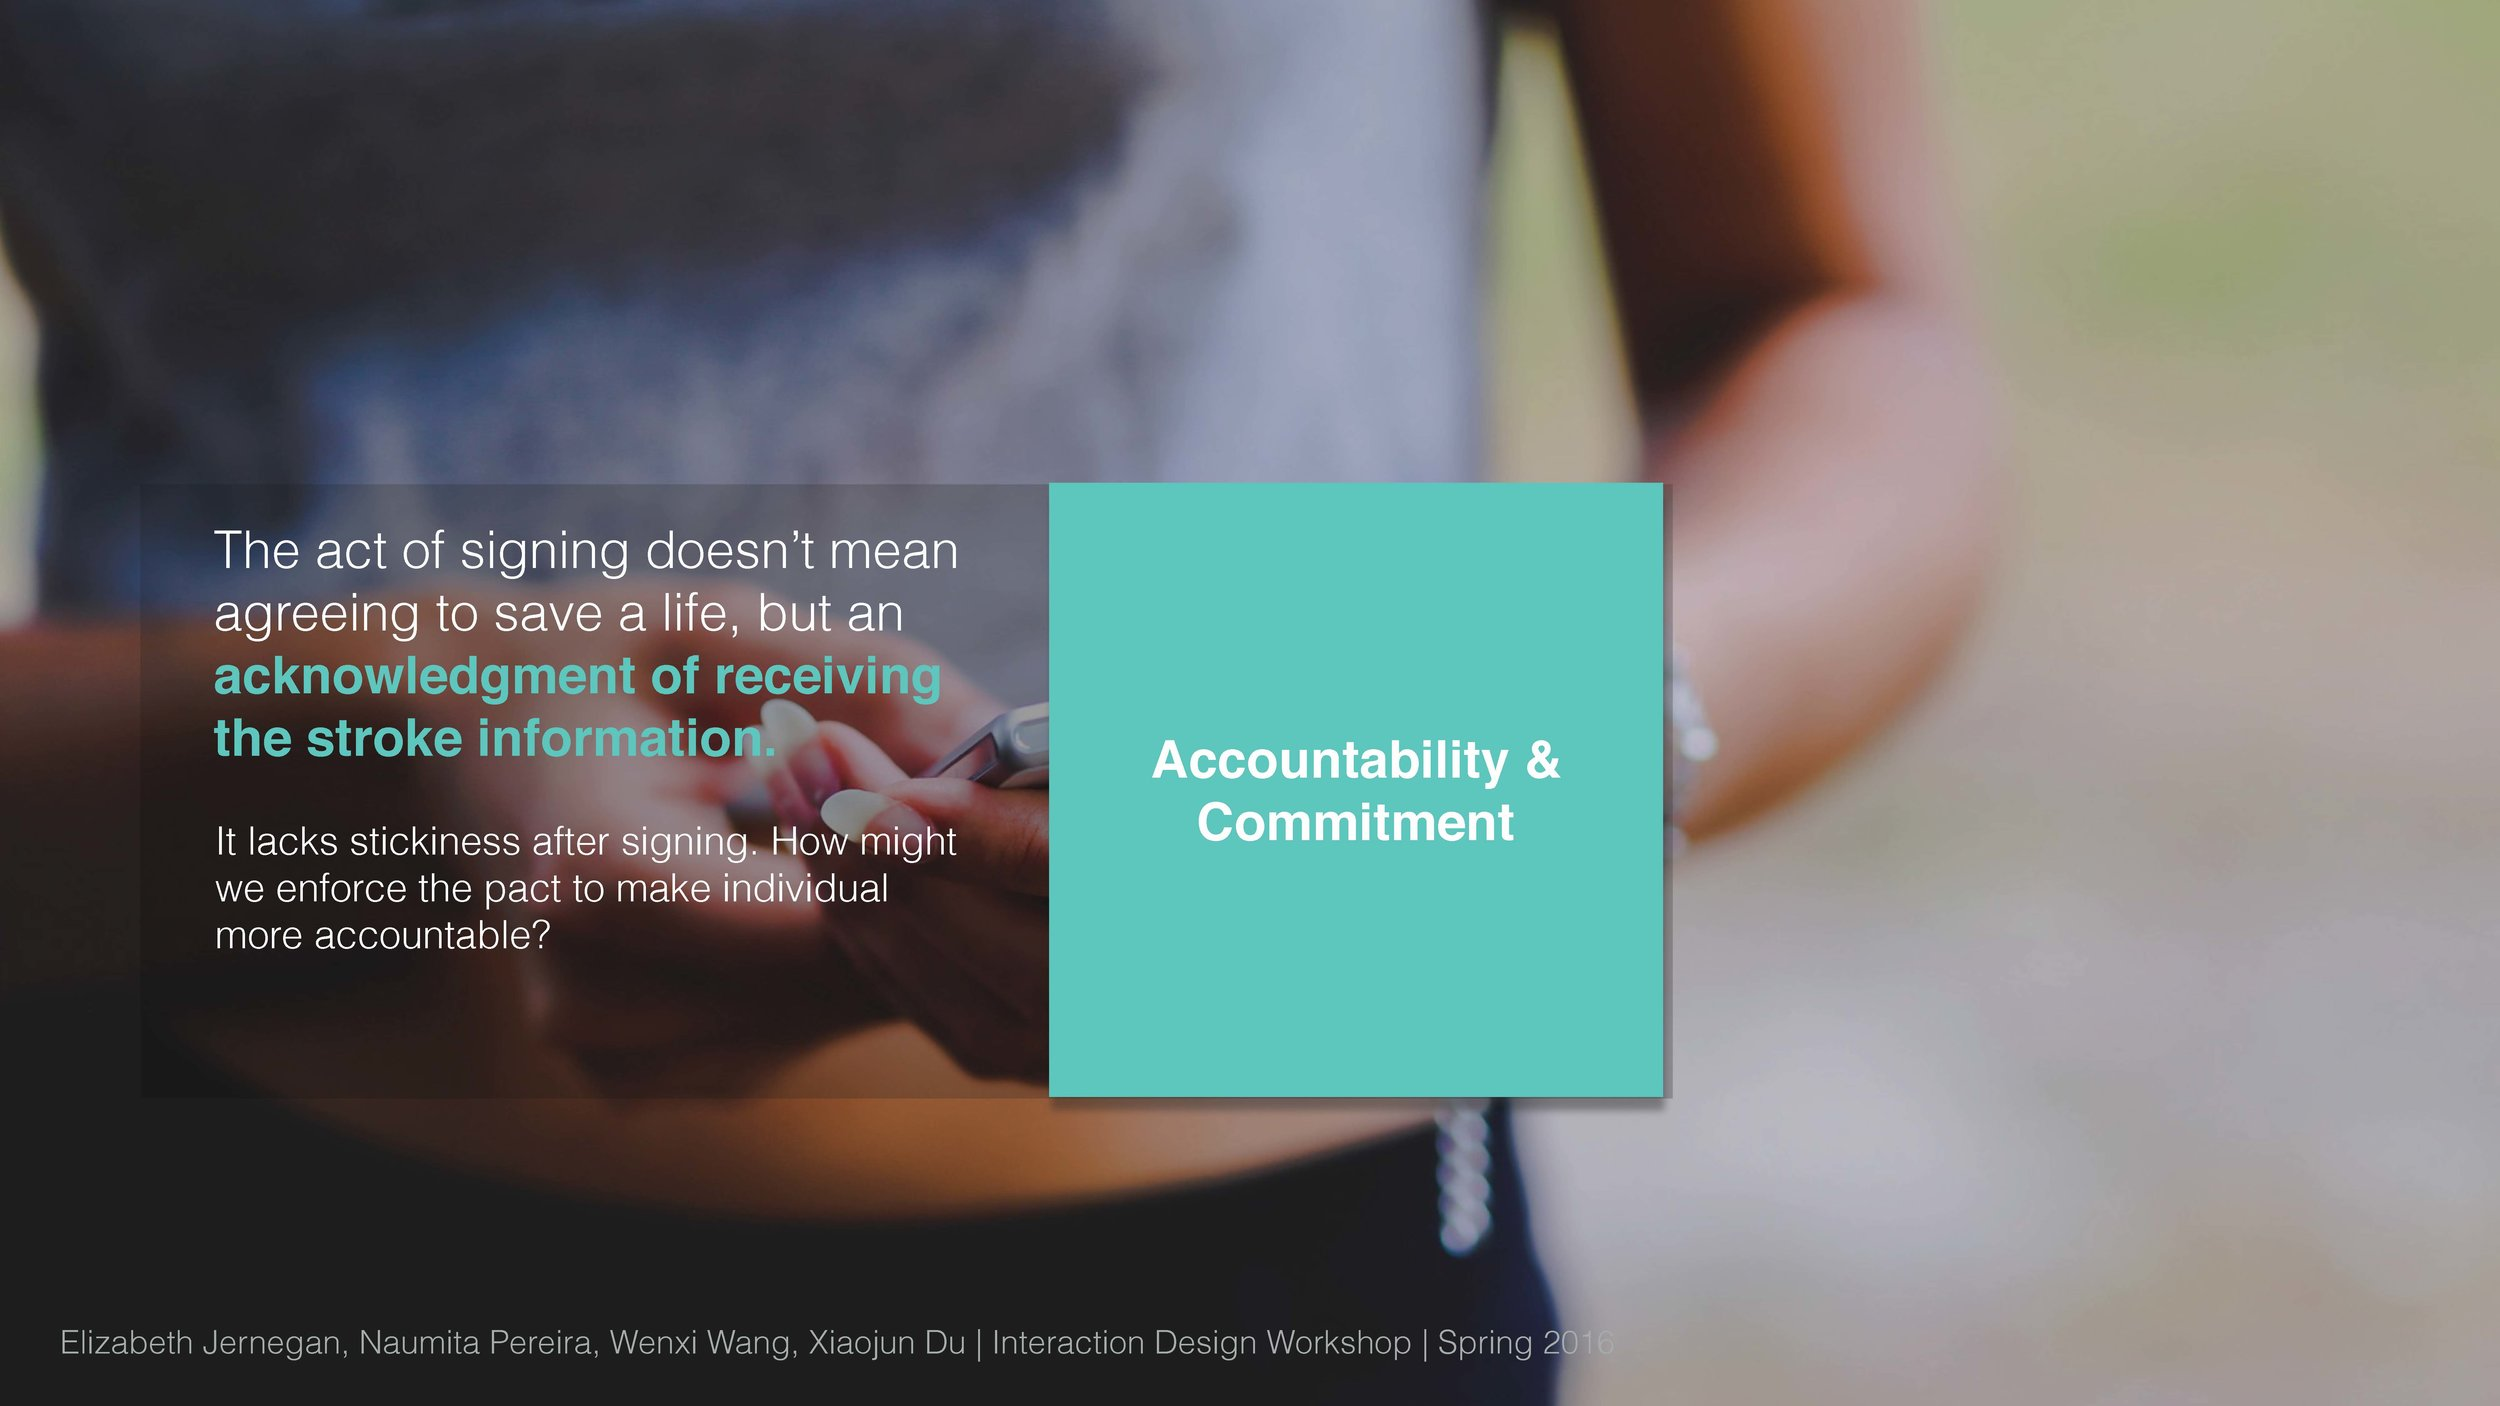 Accountability & Commitment